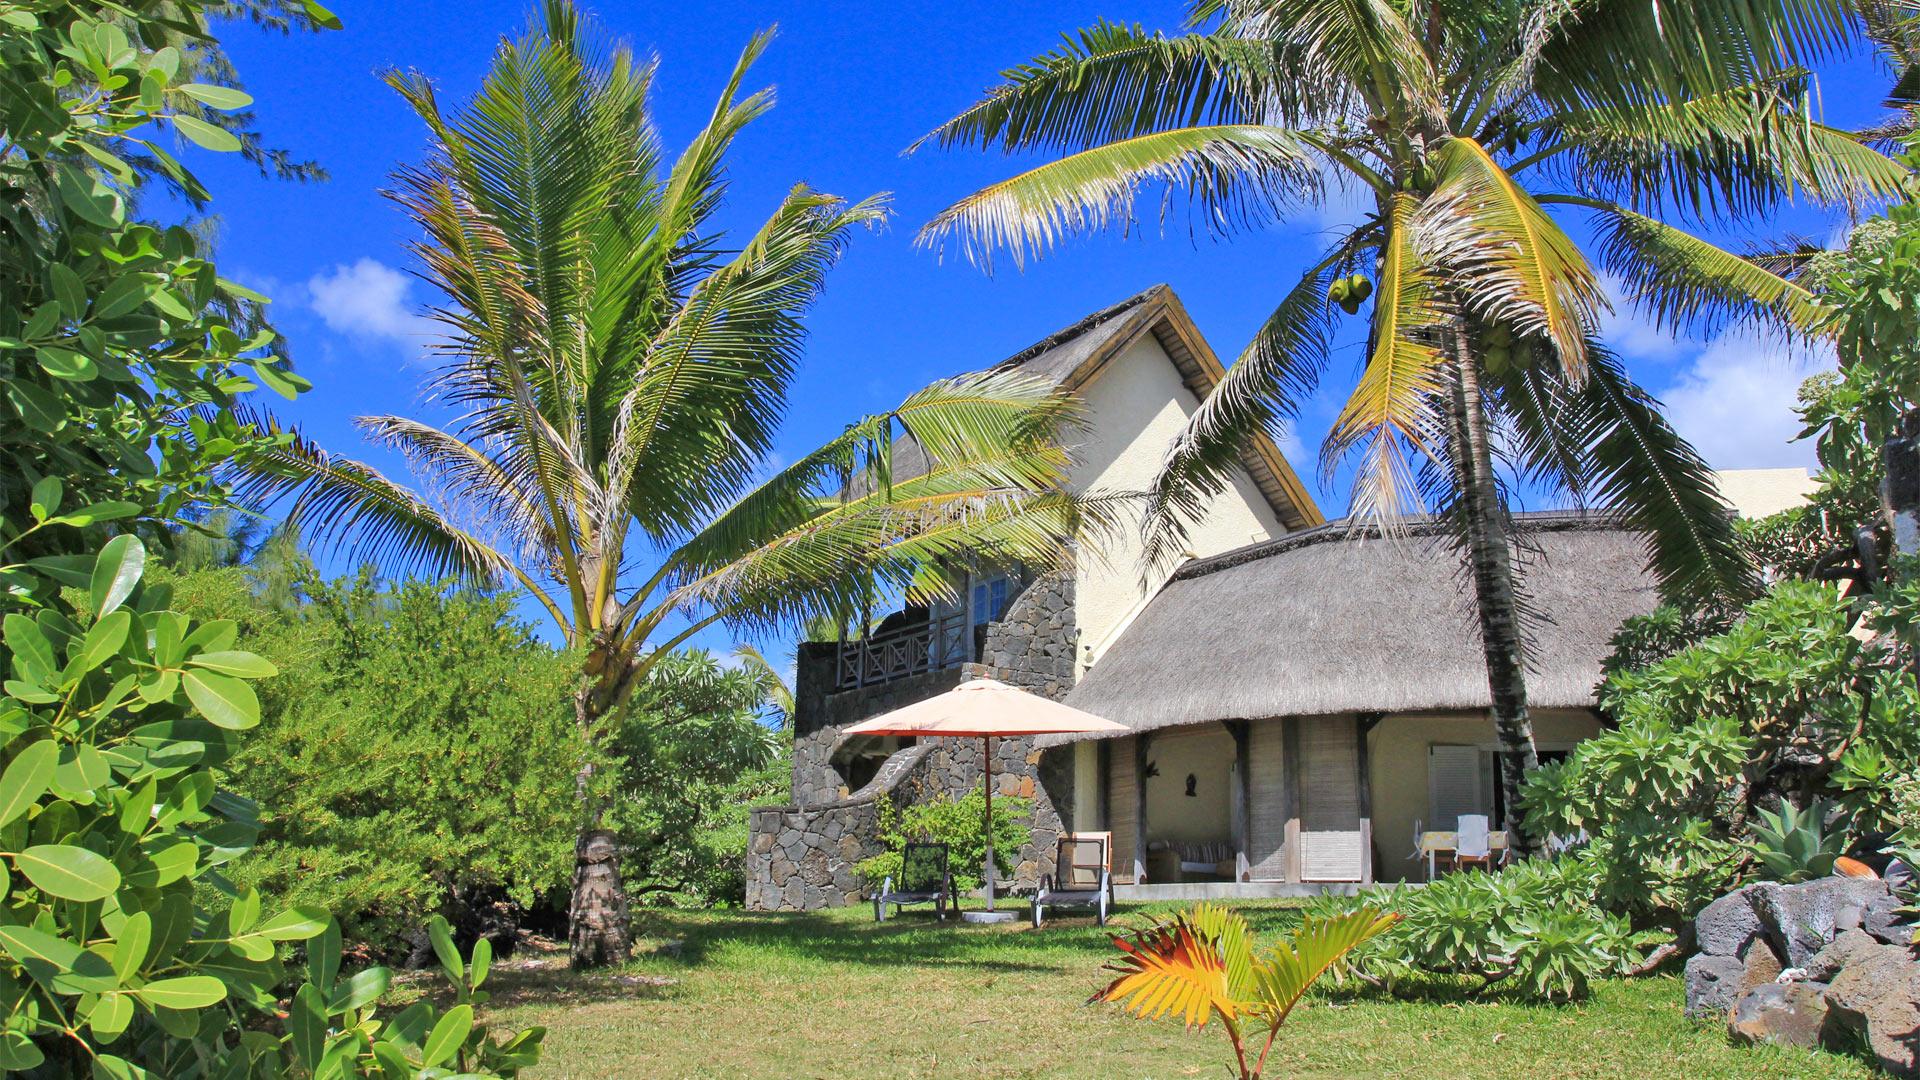 Villa Villa Vetyver, Affitto a Mauritius Est